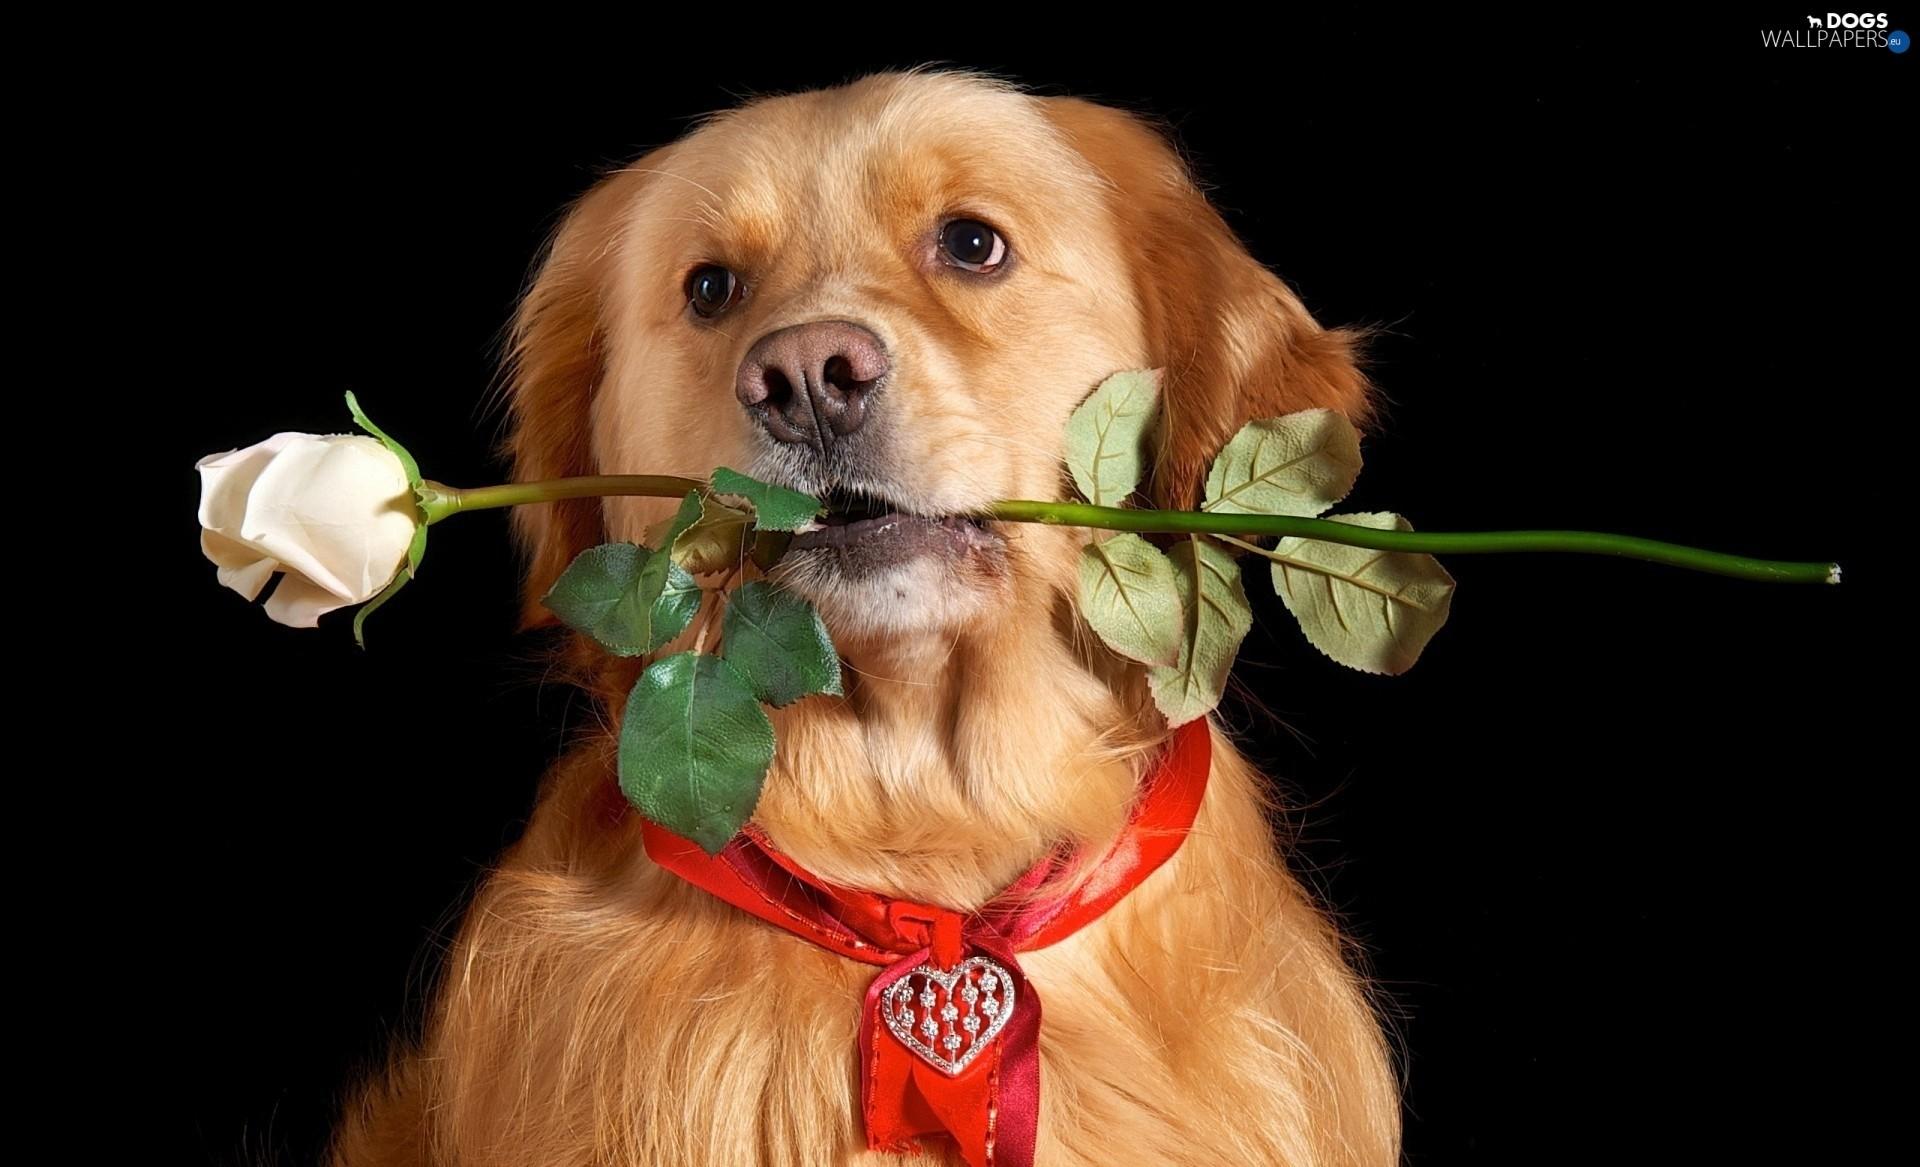 Heart teddybear, rose, dog, Valentine